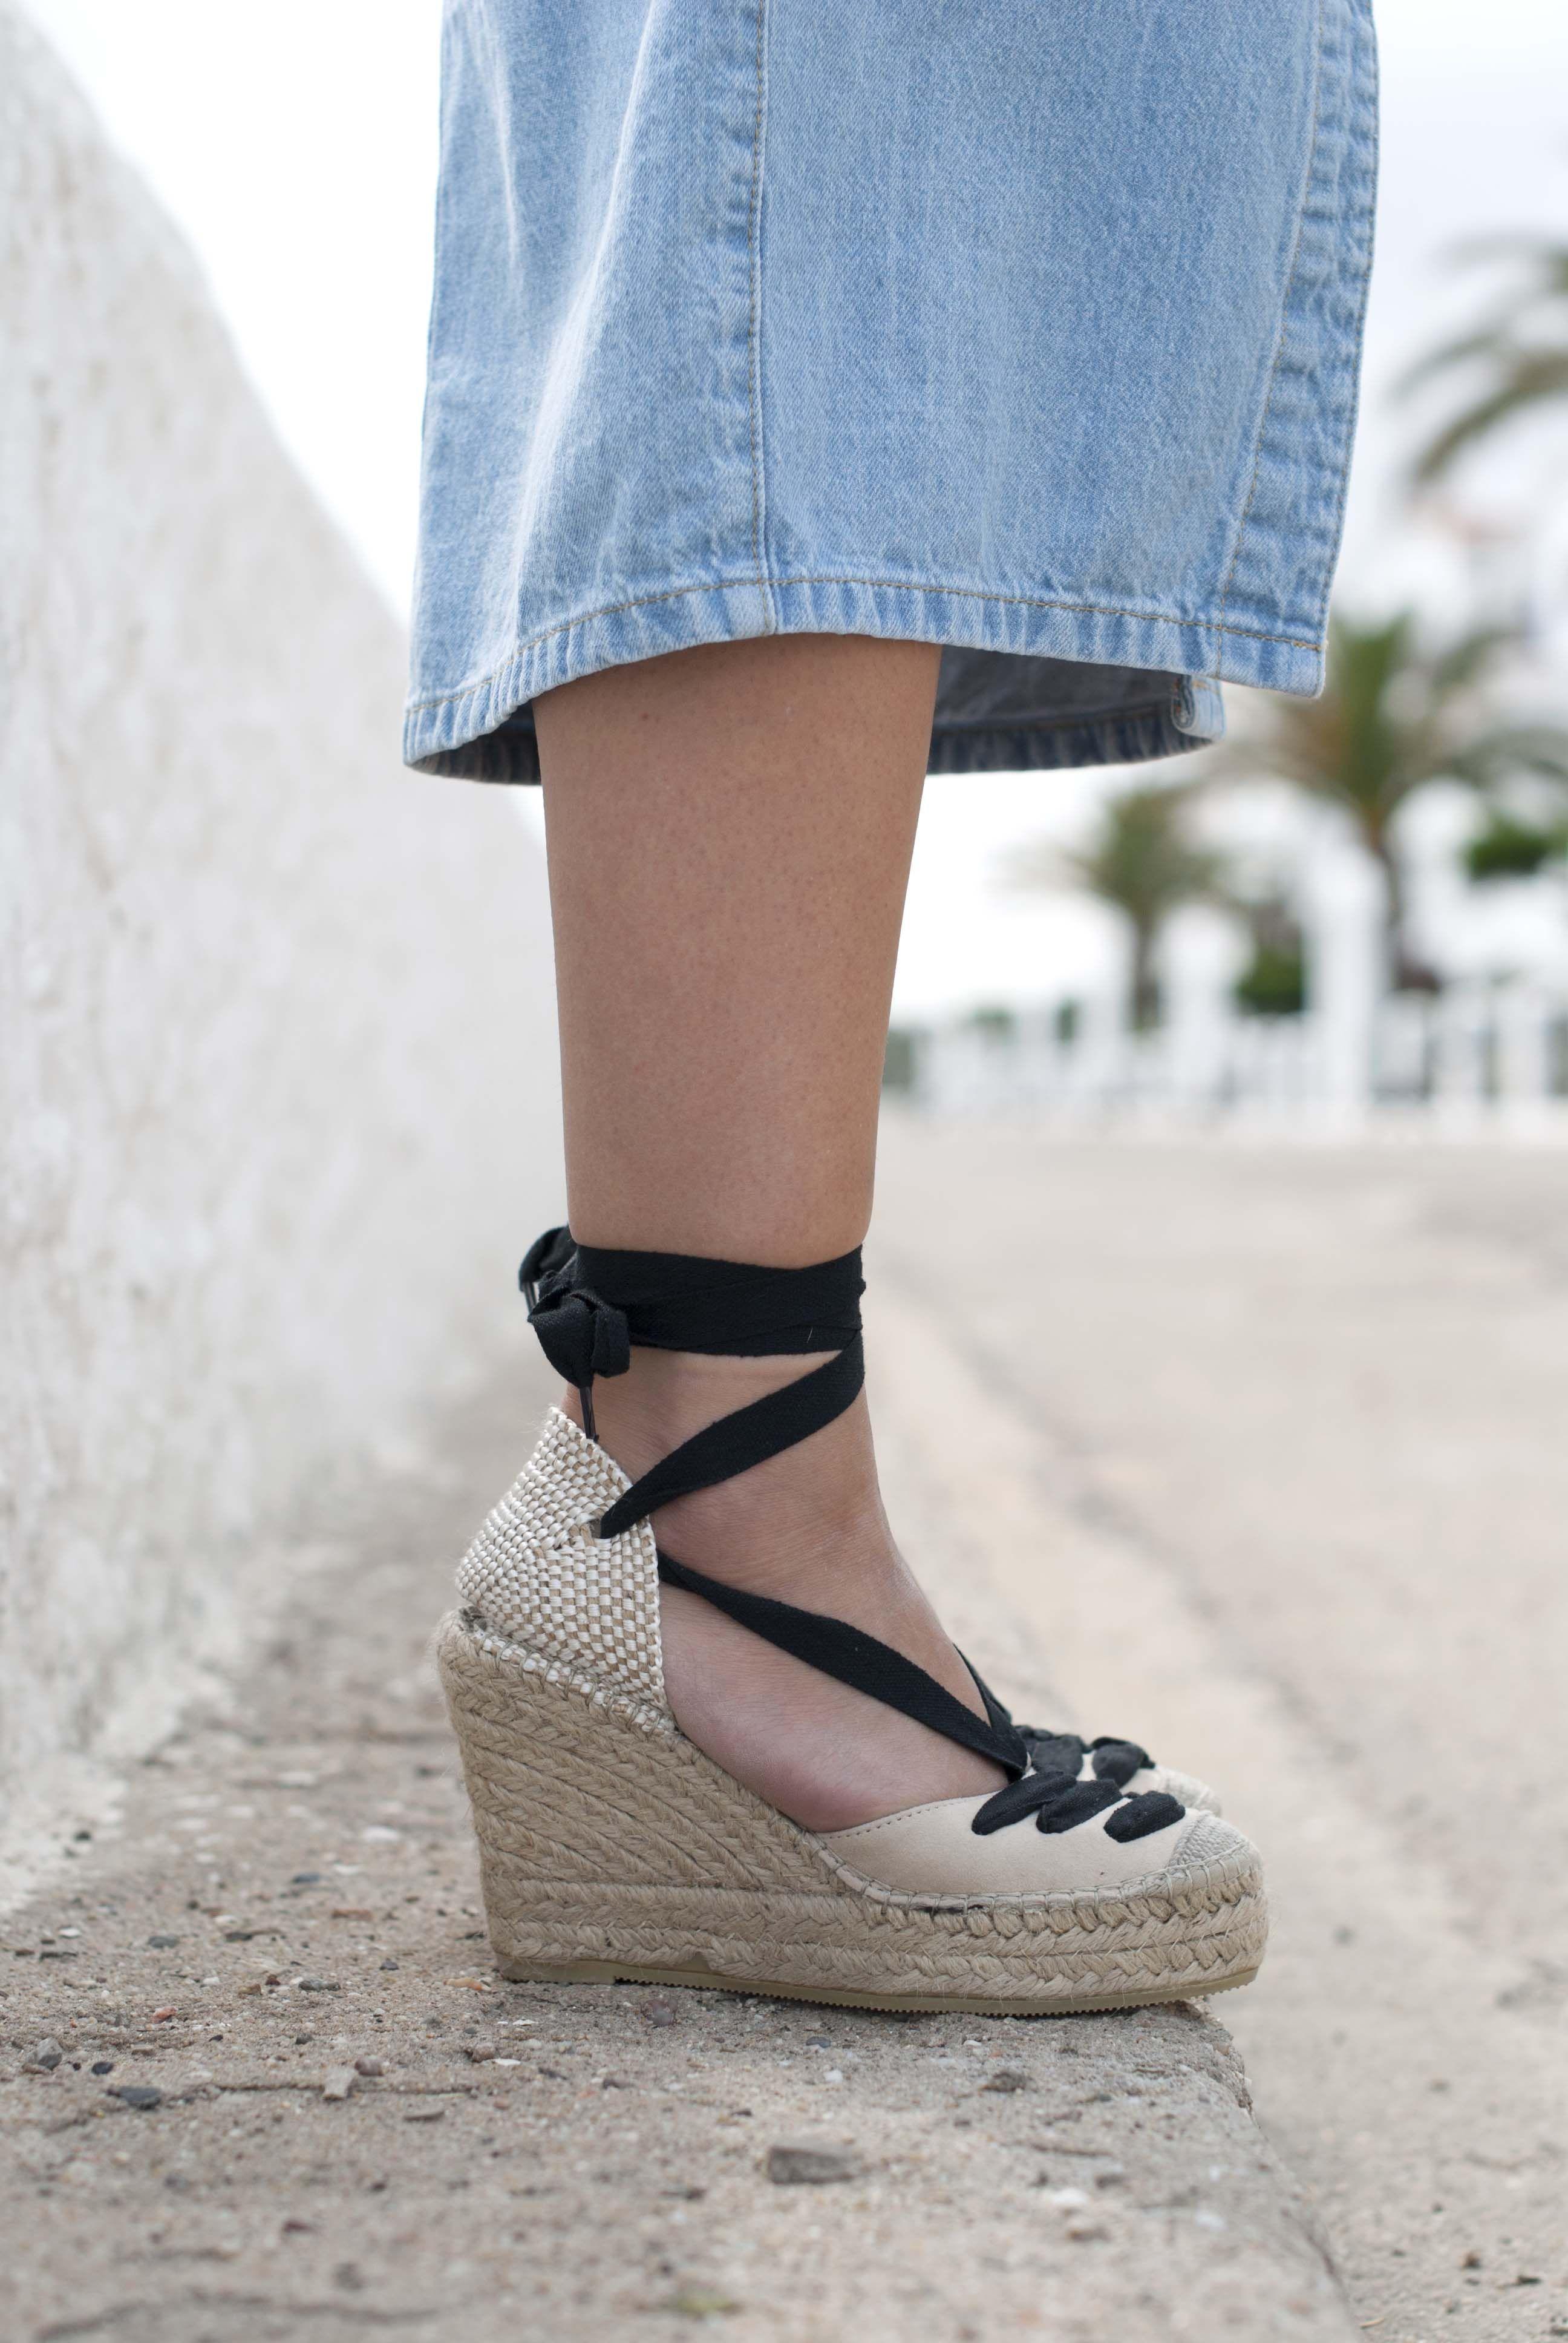 http://www.theguestgirl.com/2016/05/denim-overall-dress-with-bandana-trend-alert/  #denim #overall #dress #espadrilles #wedges #boho #chic #mediterranean #girl #drdenim #polinetmoi #bandana #streetsyle #theguestgirl